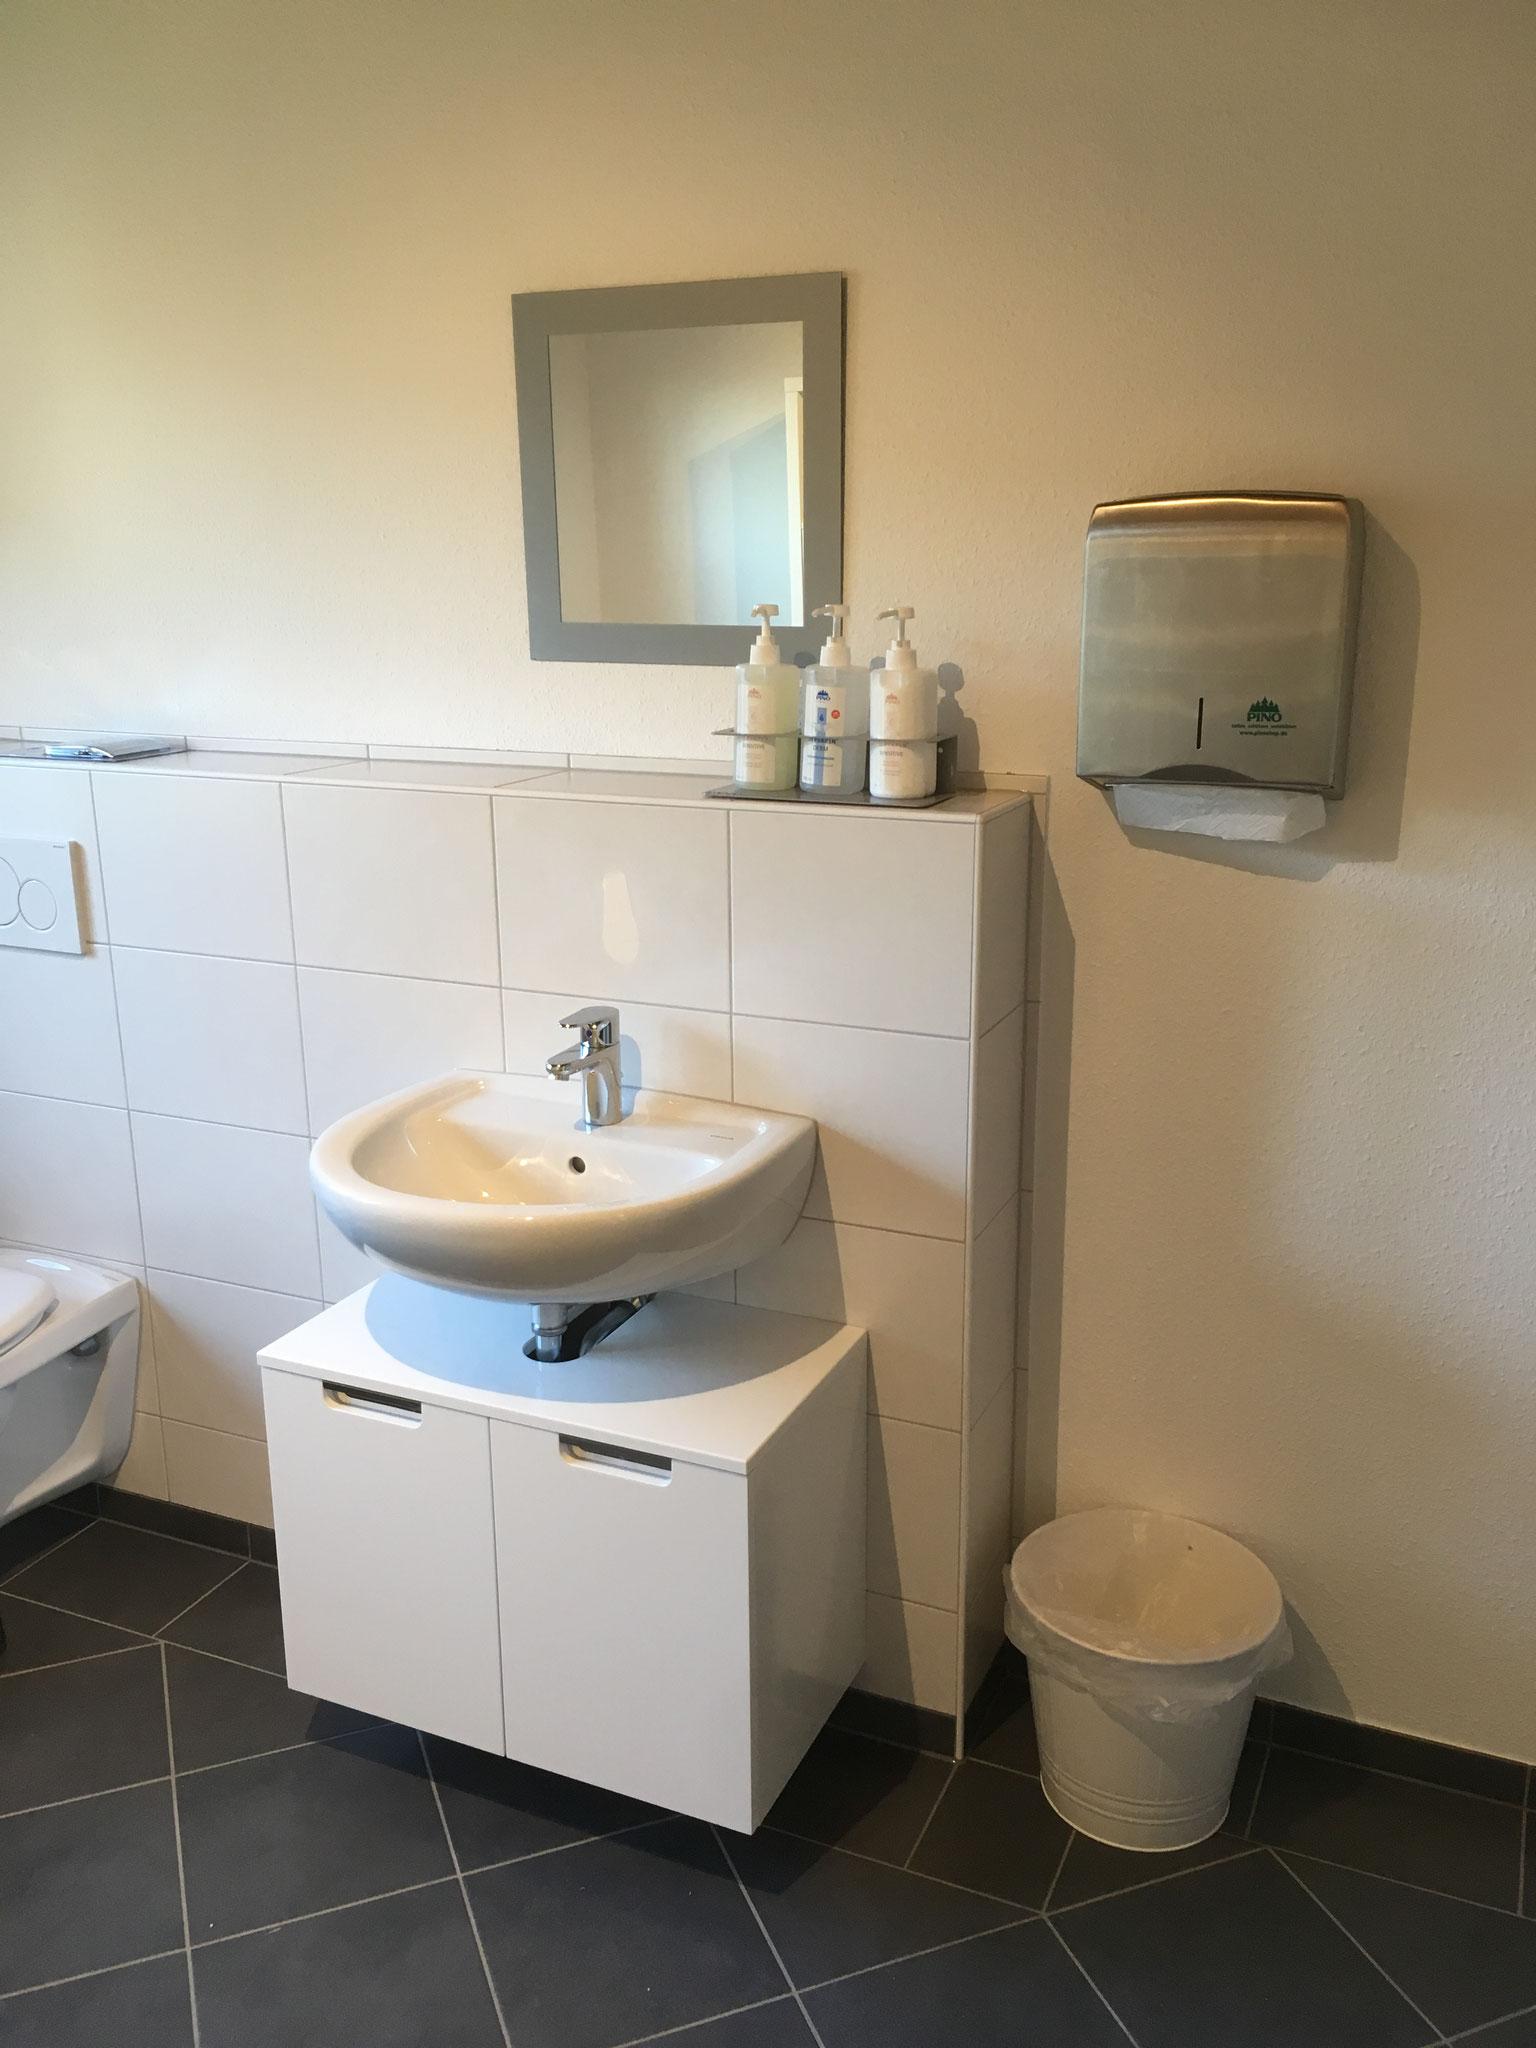 WC: groß und geräumig.